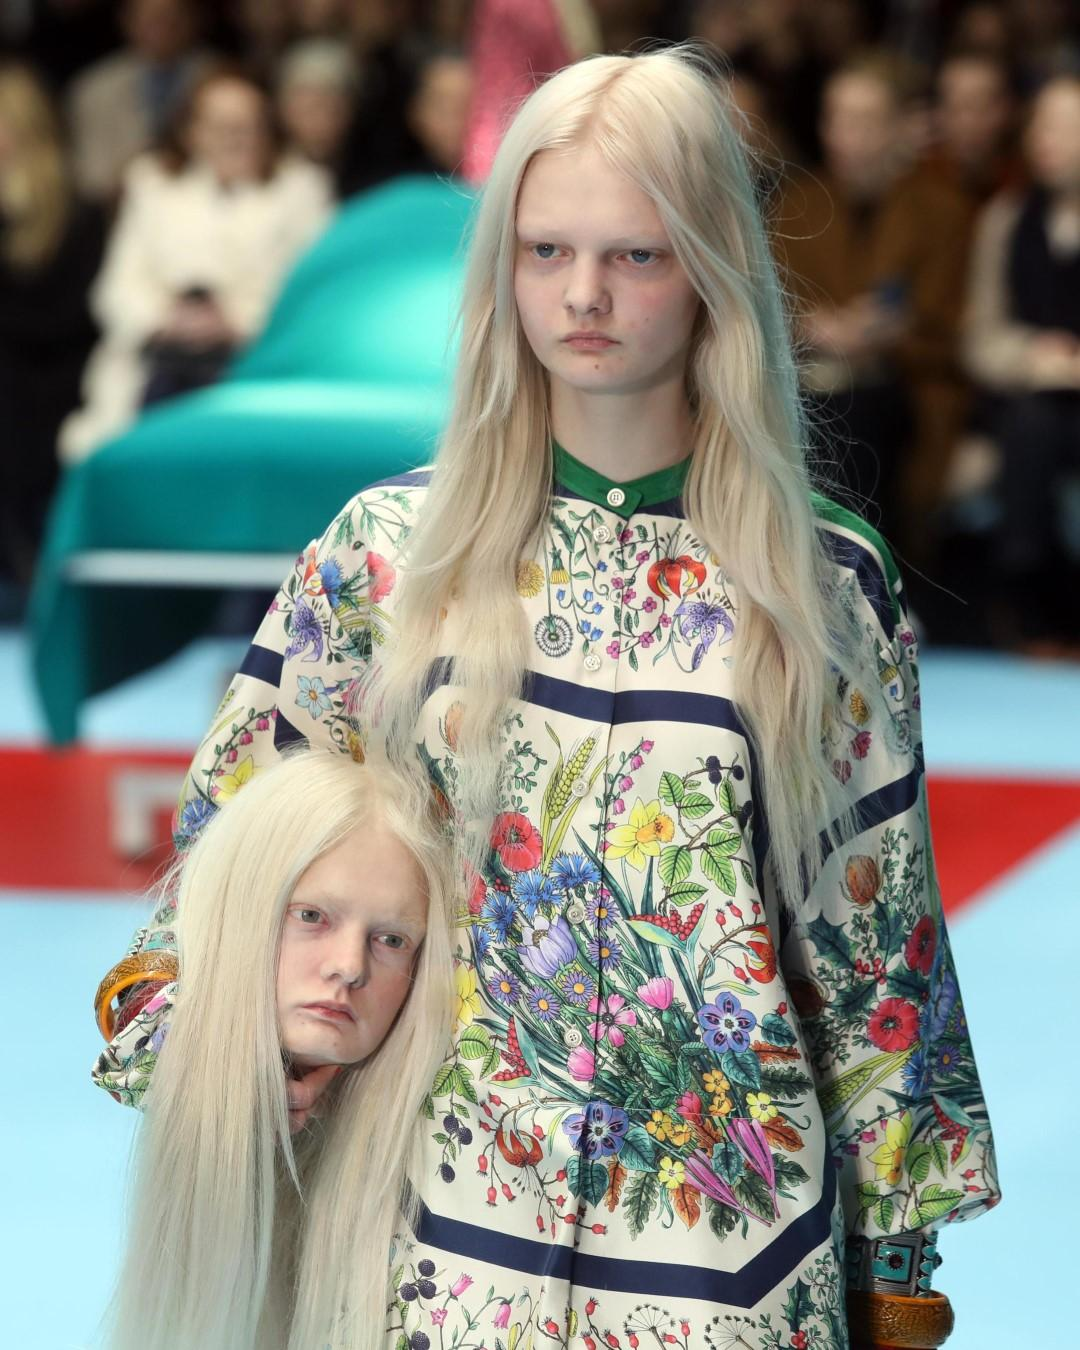 Milano Fashion Week Report A I 2018-2019 - I MURRI MURR d8e4a4ebdc5